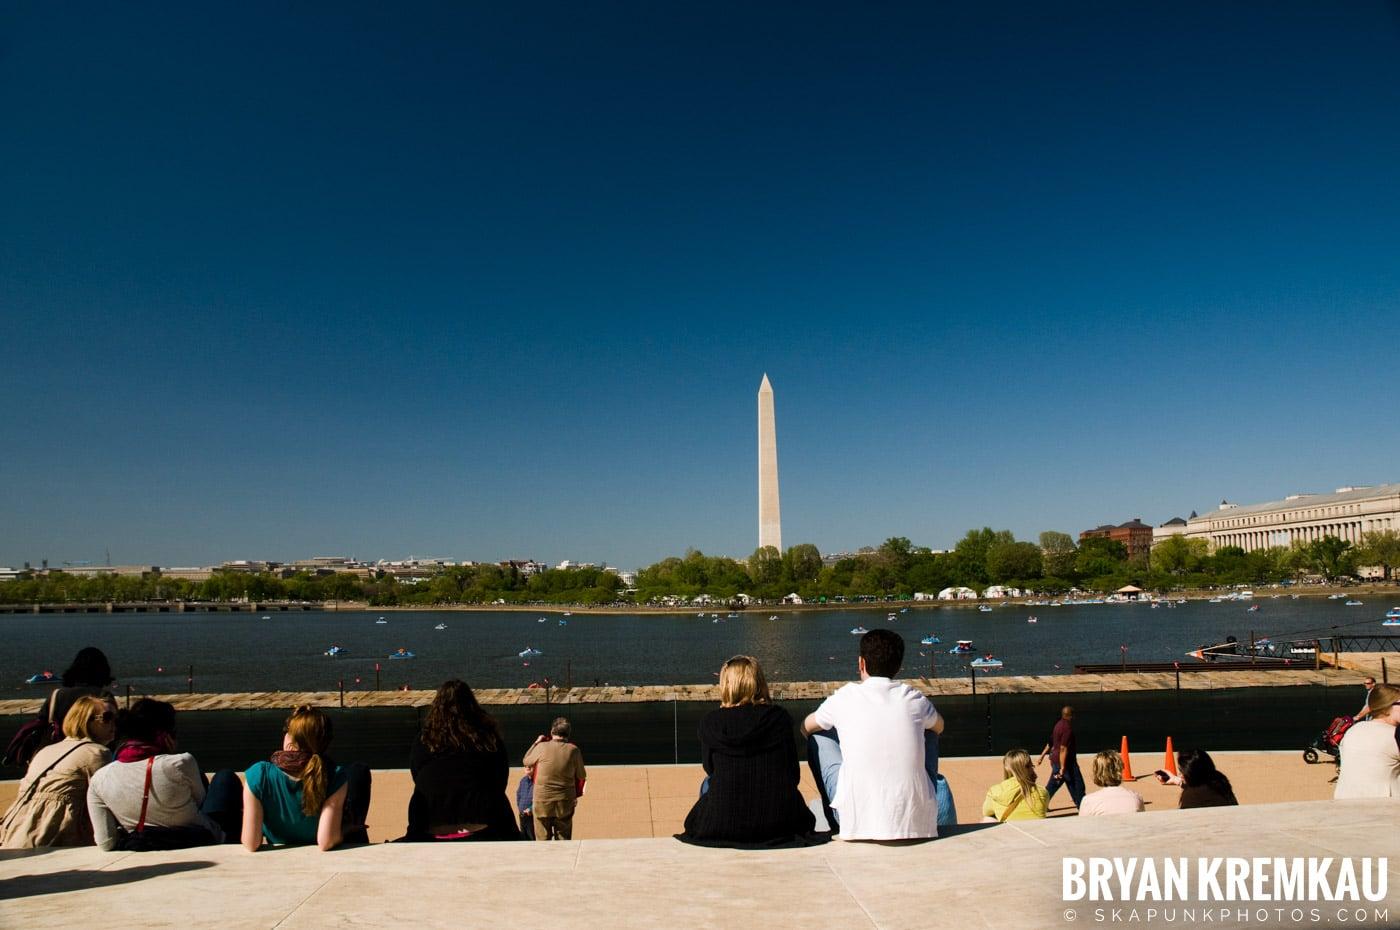 Washington, DC Trip - Day 3 - 4.10.10 (12)